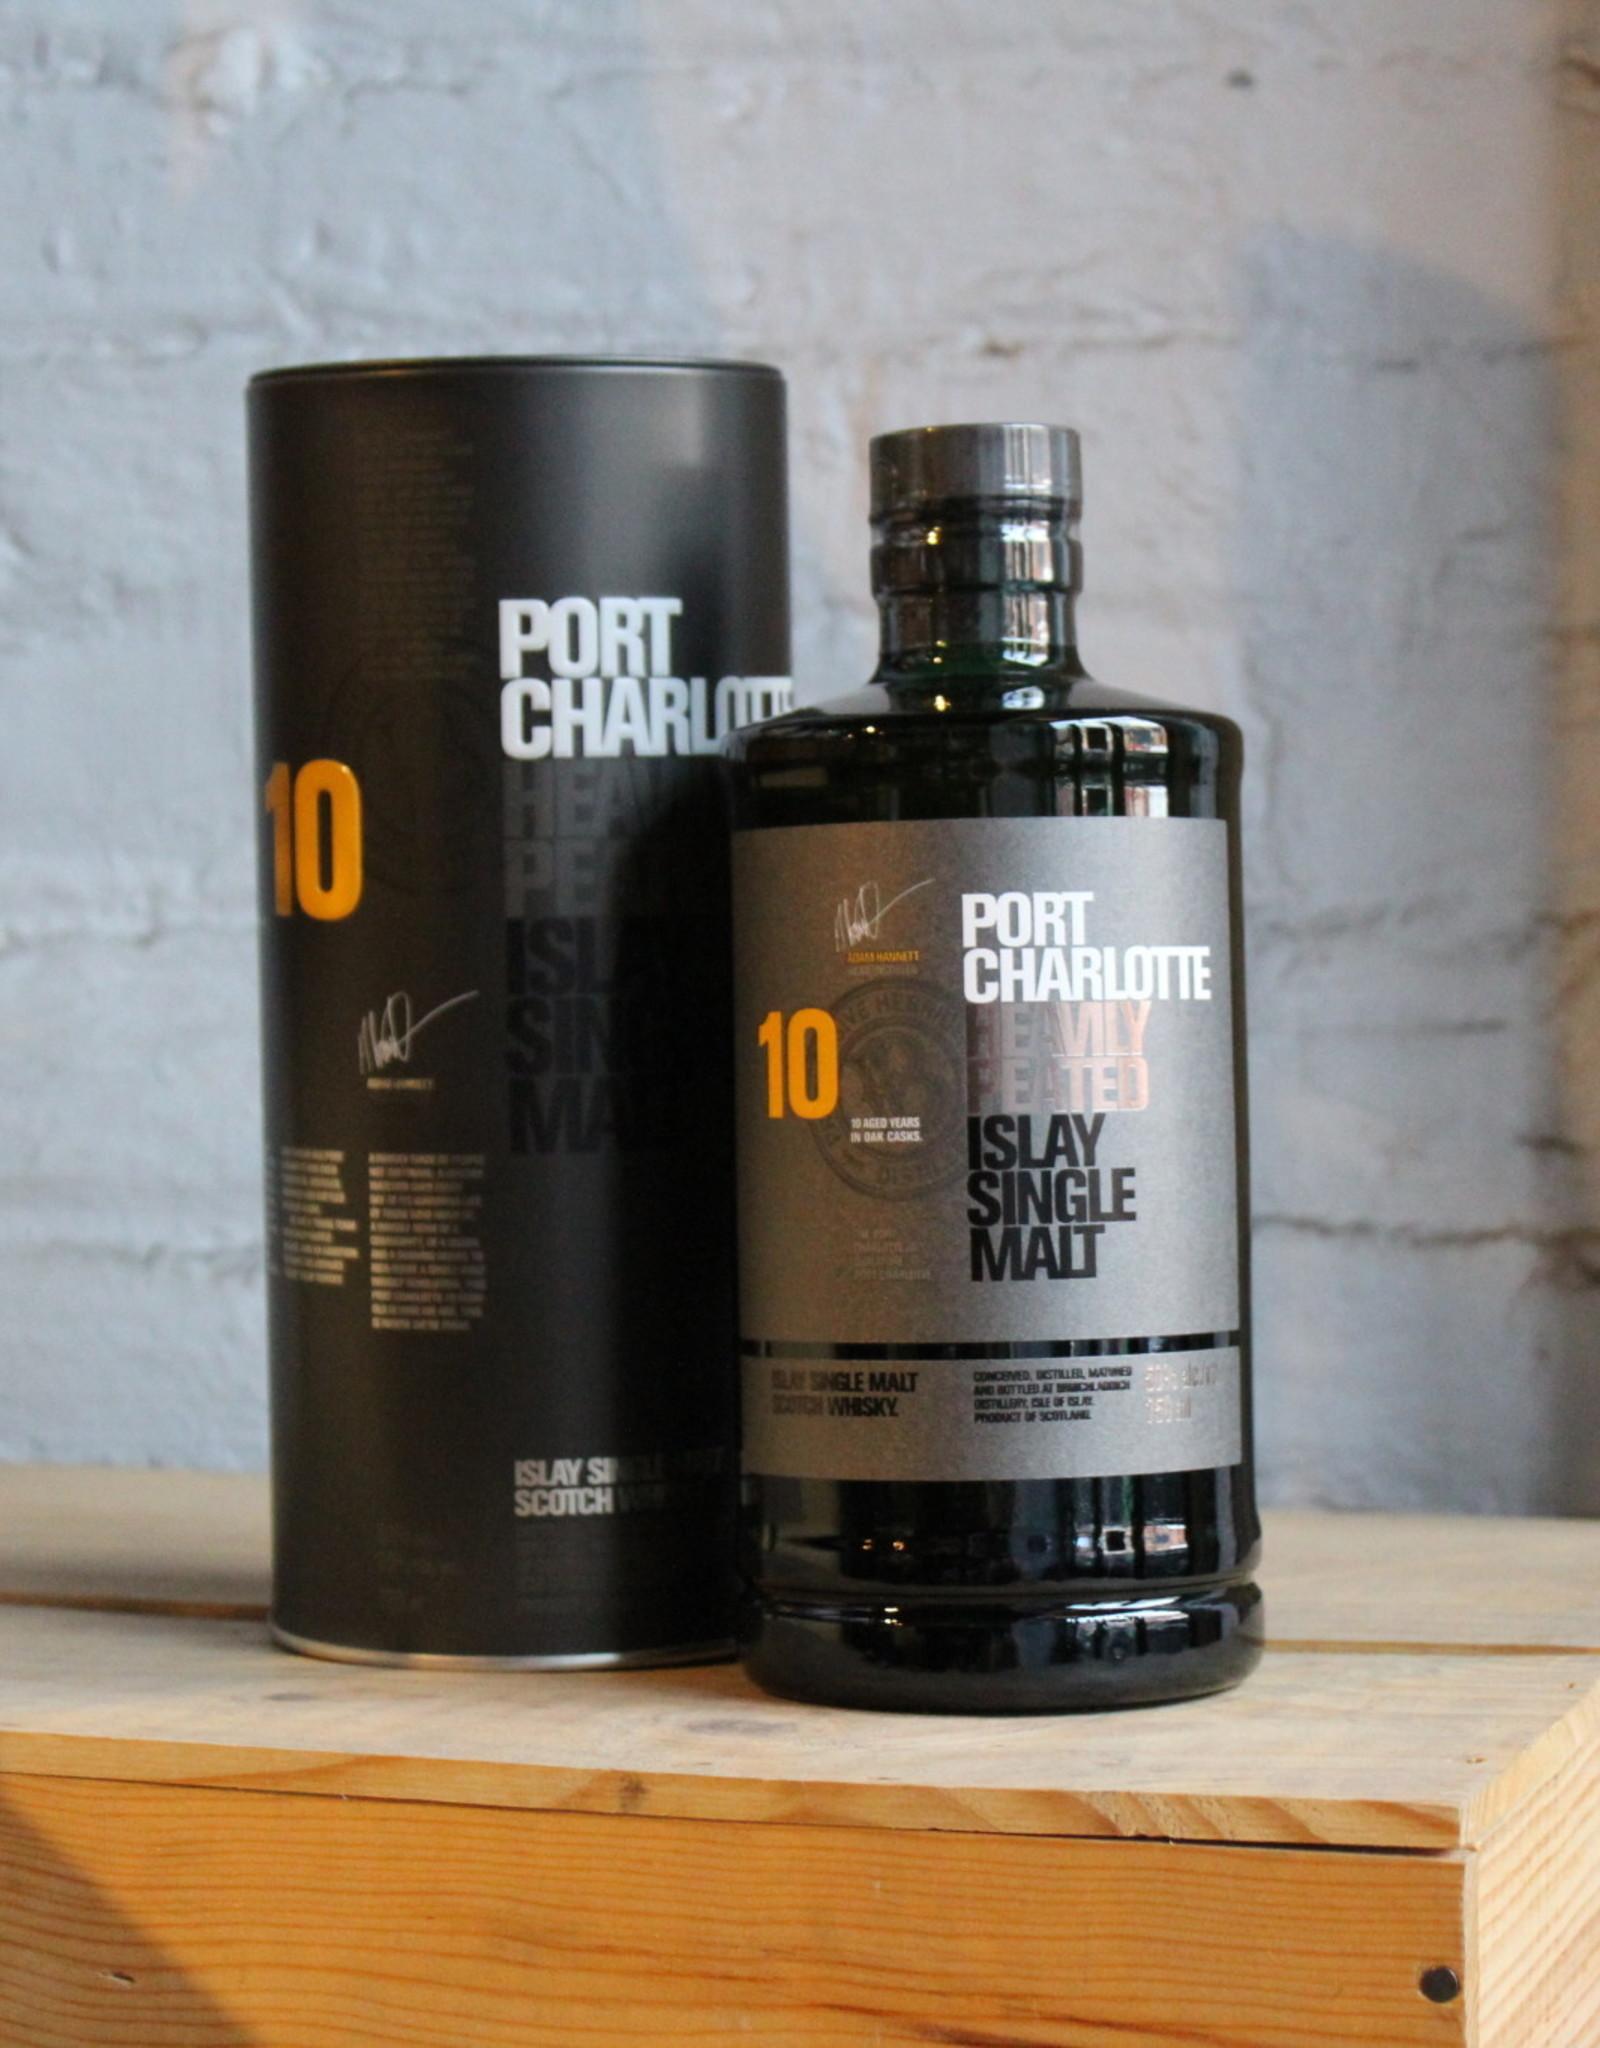 Port Charlotte 10yr Heavily Peated Single Malt Scotch Whisky - Islay, Scotland (750ml)